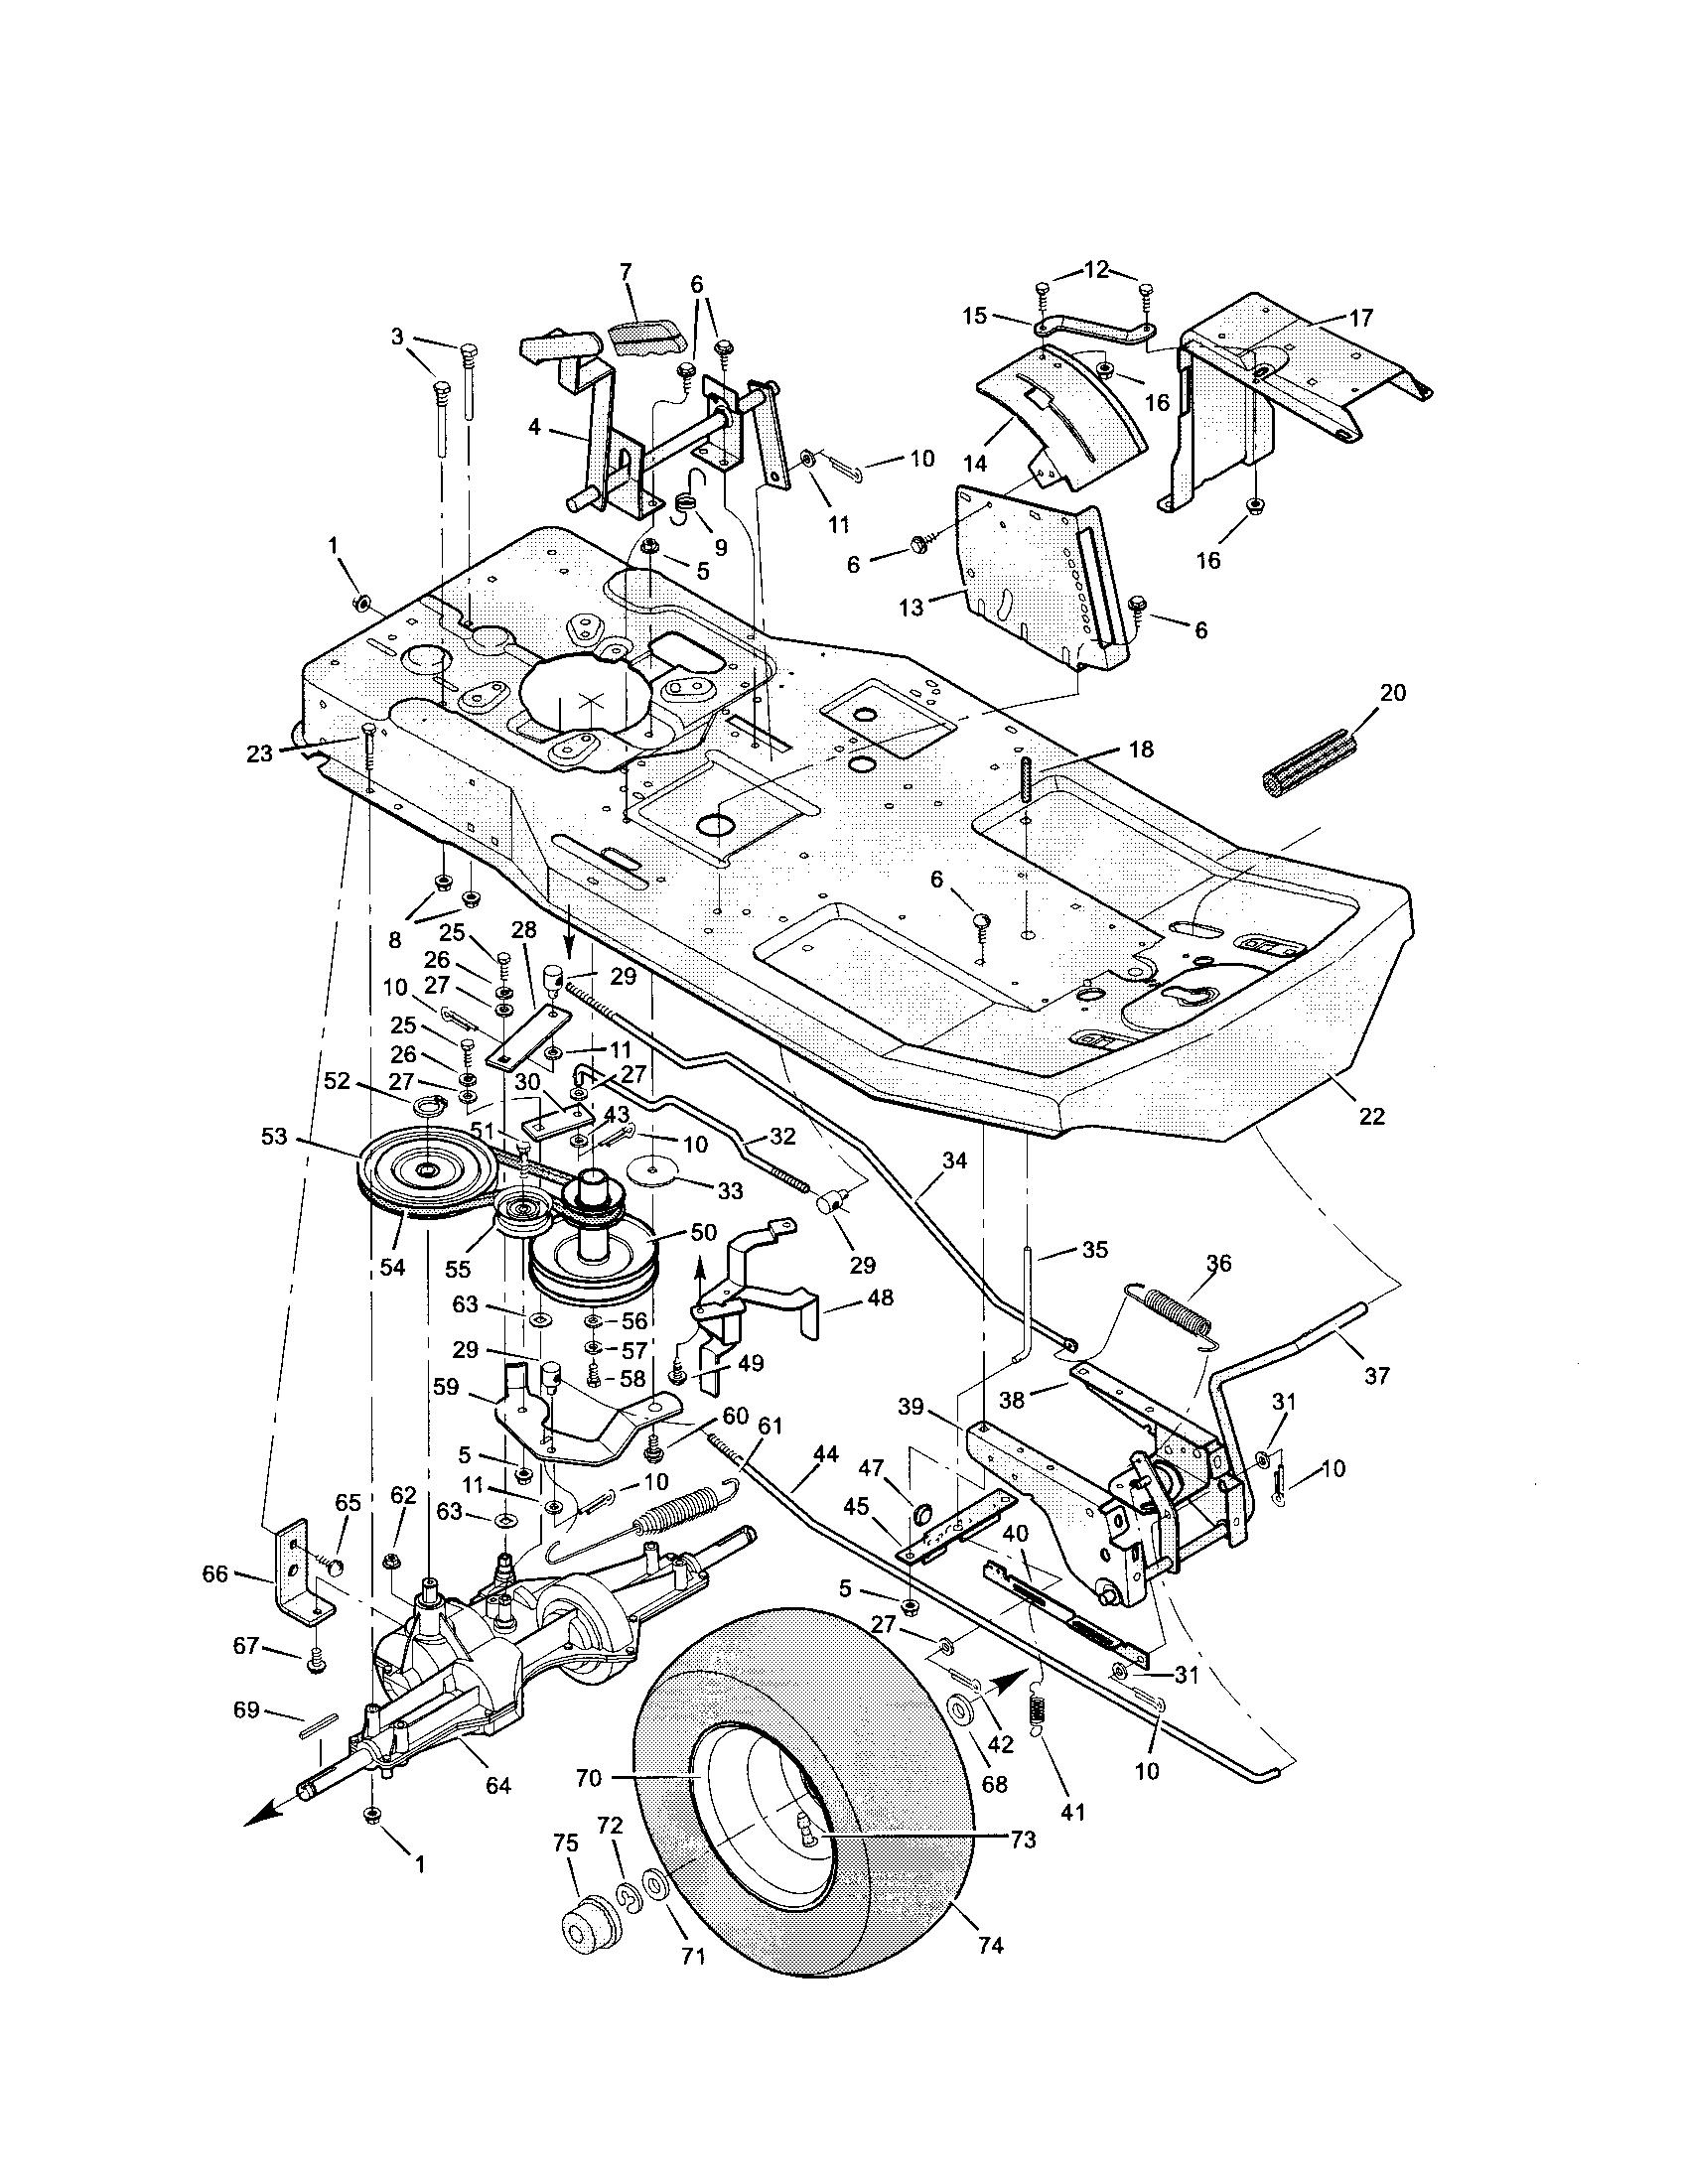 craftsman dyt 4000 wiring diagram circuit breaker australia for get free image